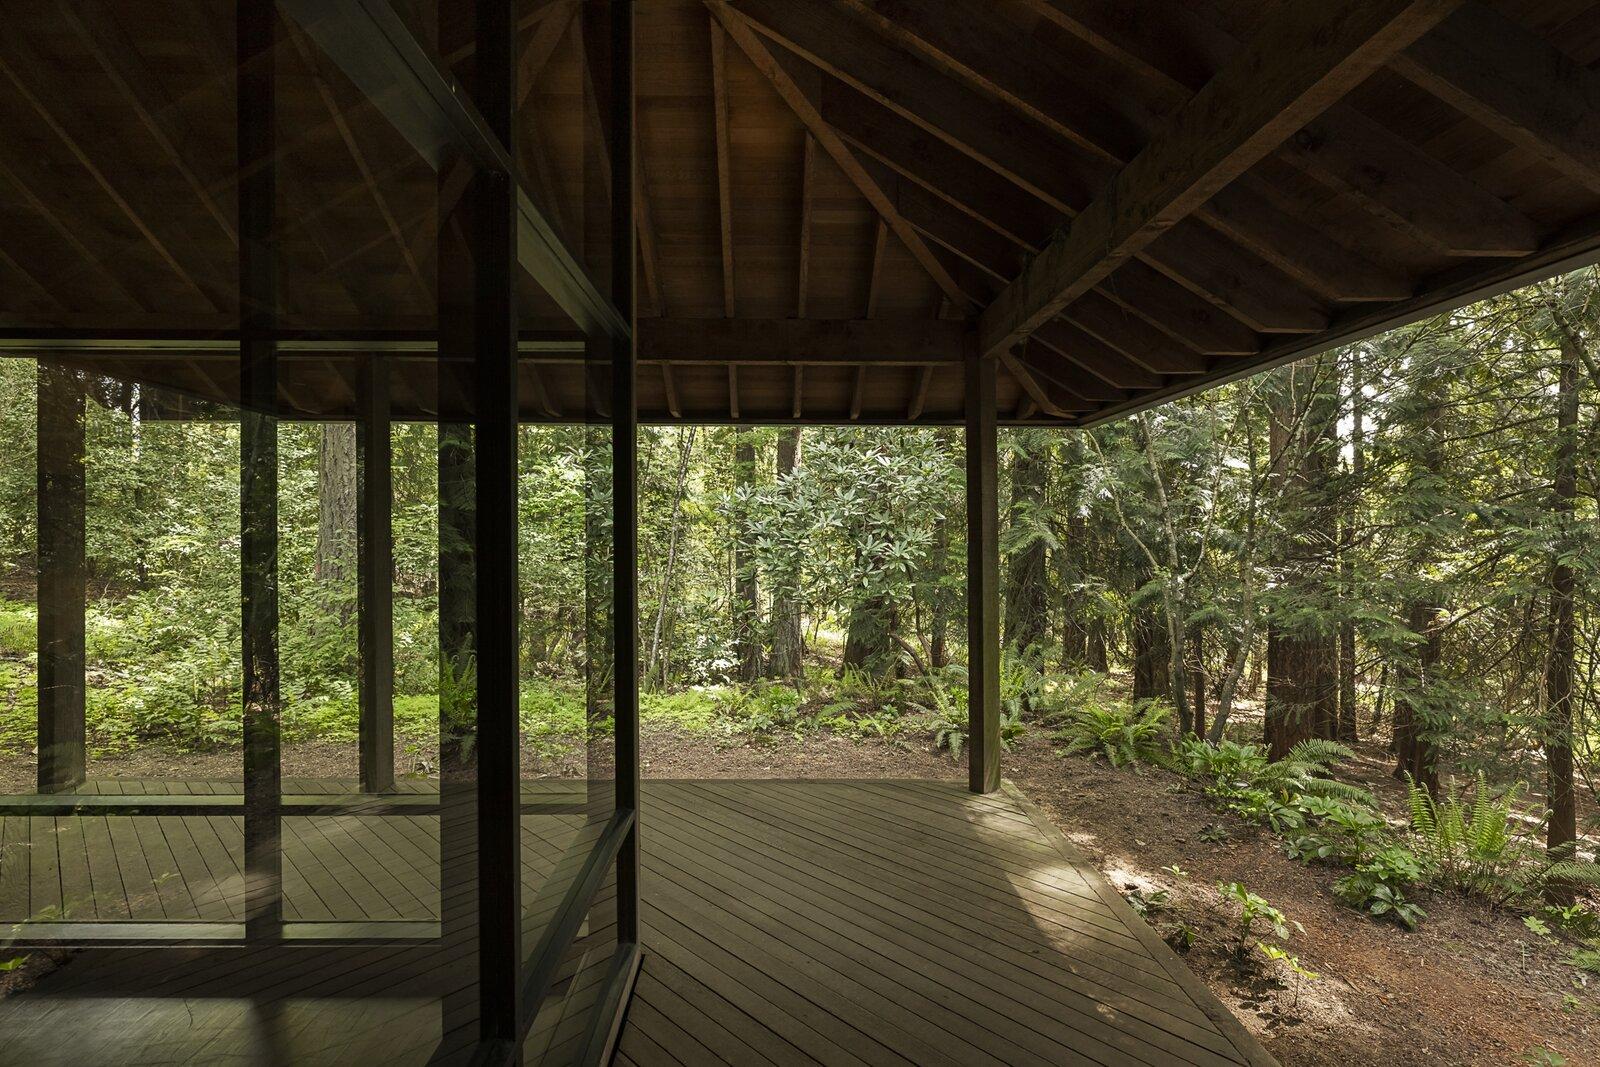 Porch of the Mason Residence by Saul Zaik